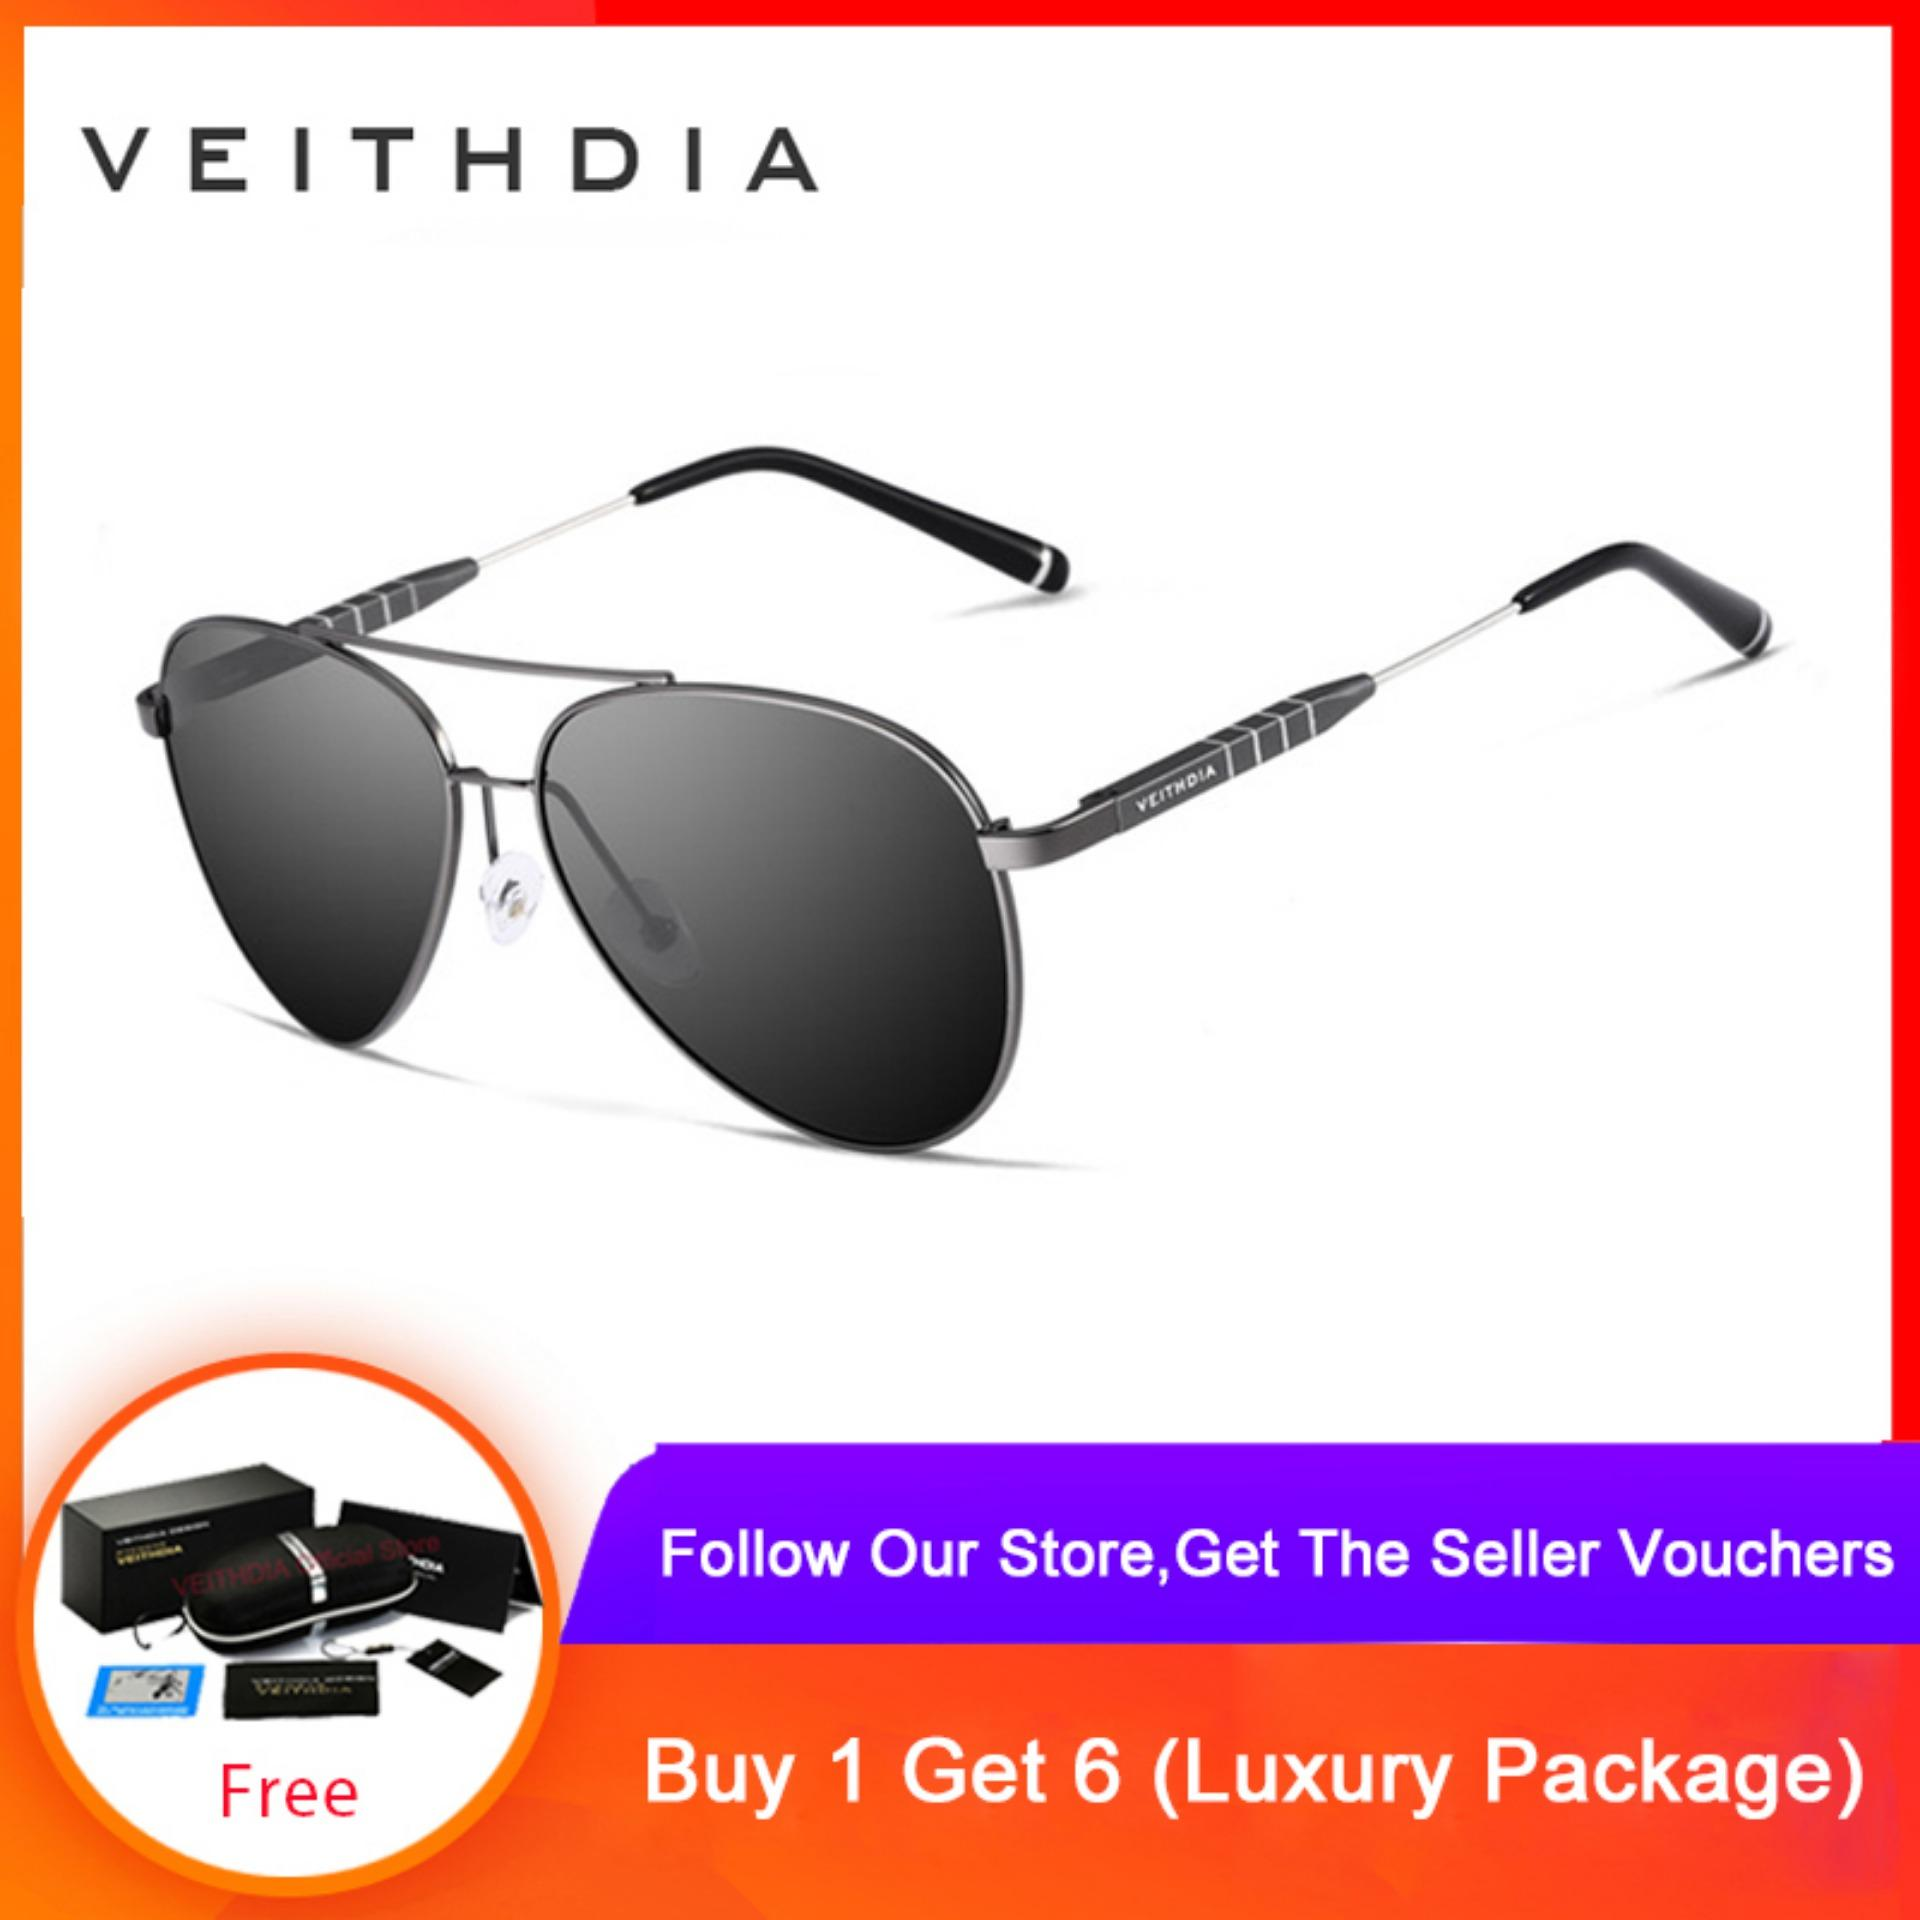 0b2ab4d8f26a1 VEITHDIA Fashion Unisex Aluminum Men Sun Glasses Polarized Mirror Lens Male Eyewear  Sunglasses For Women Men